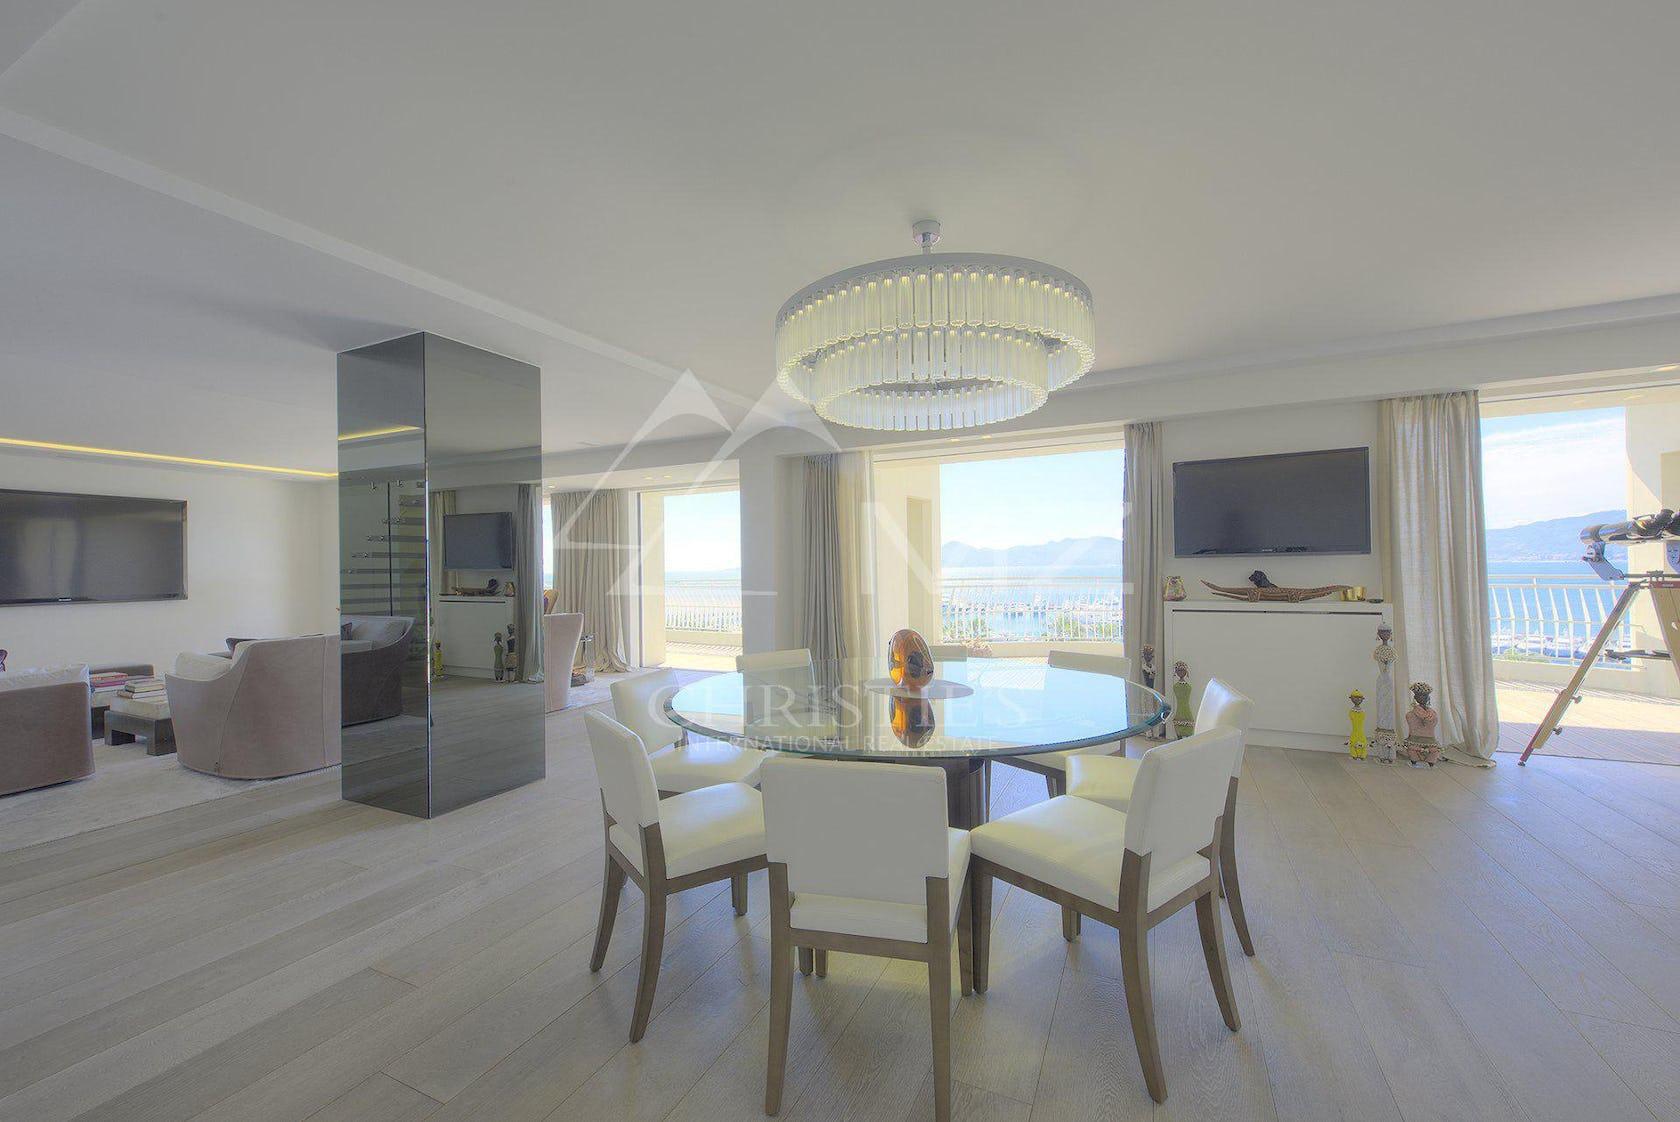 flooring floor chair furniture interior design indoors wood hardwood living room room